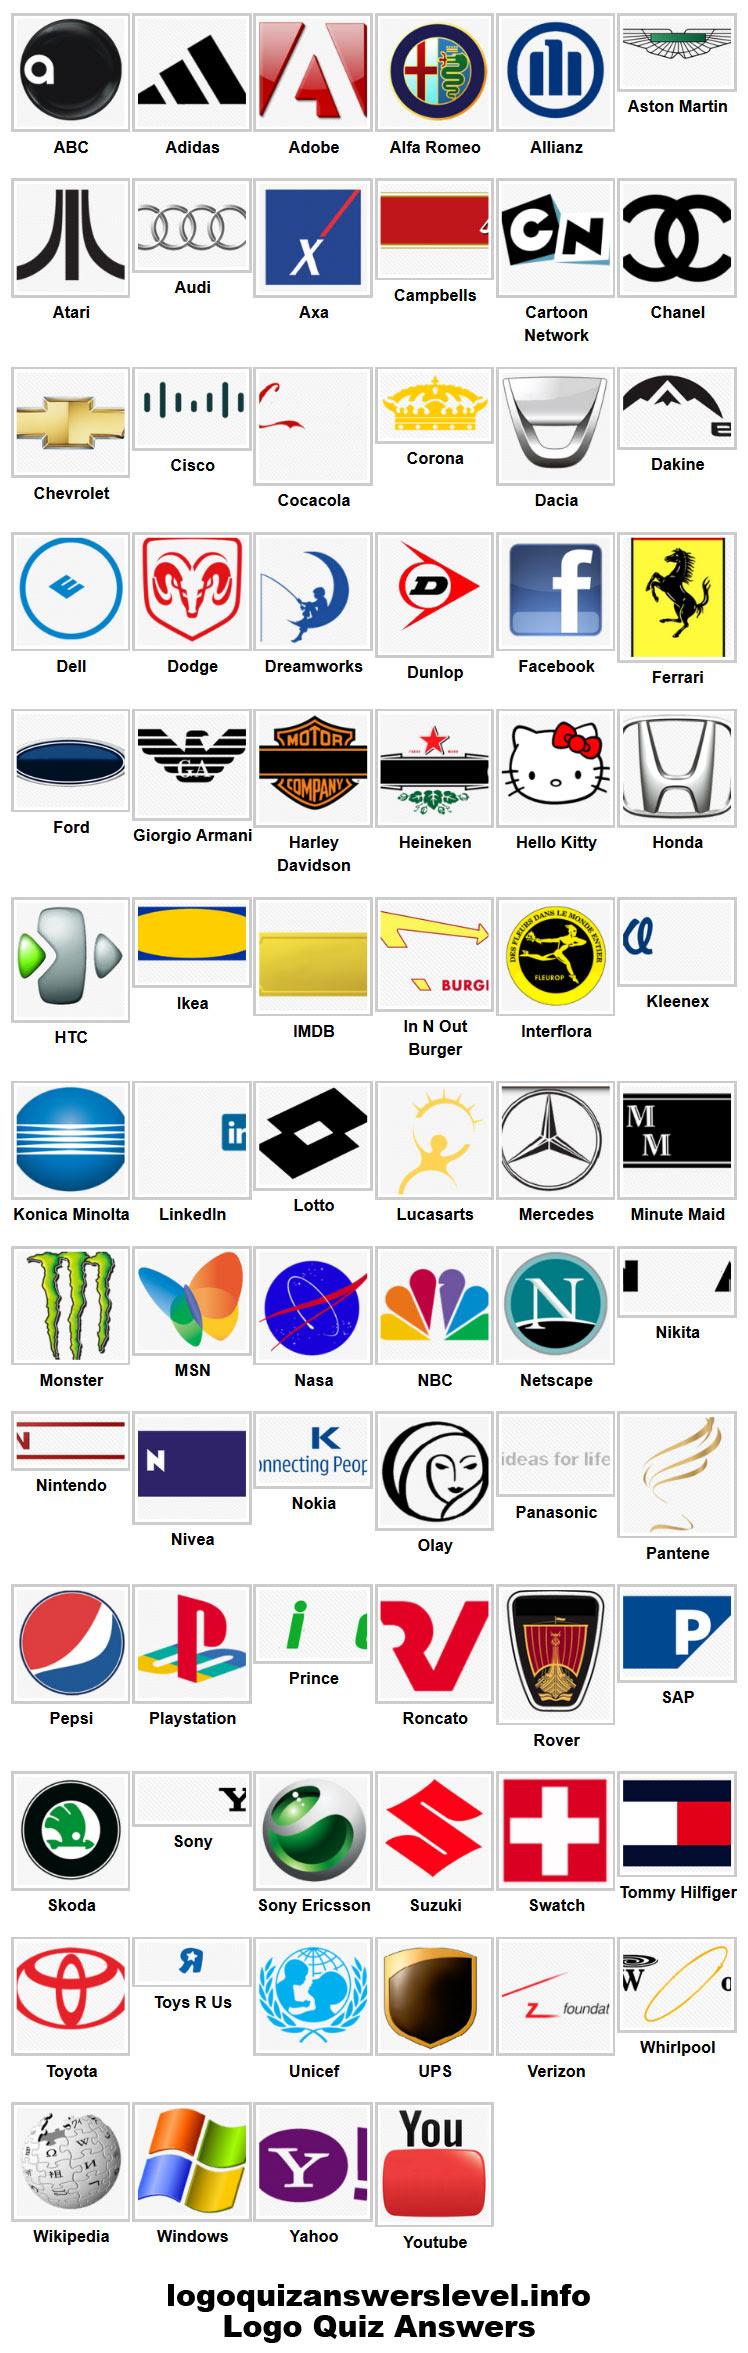 Logo Game Answers Level 2 : answers, level, Answers, Level, Internet